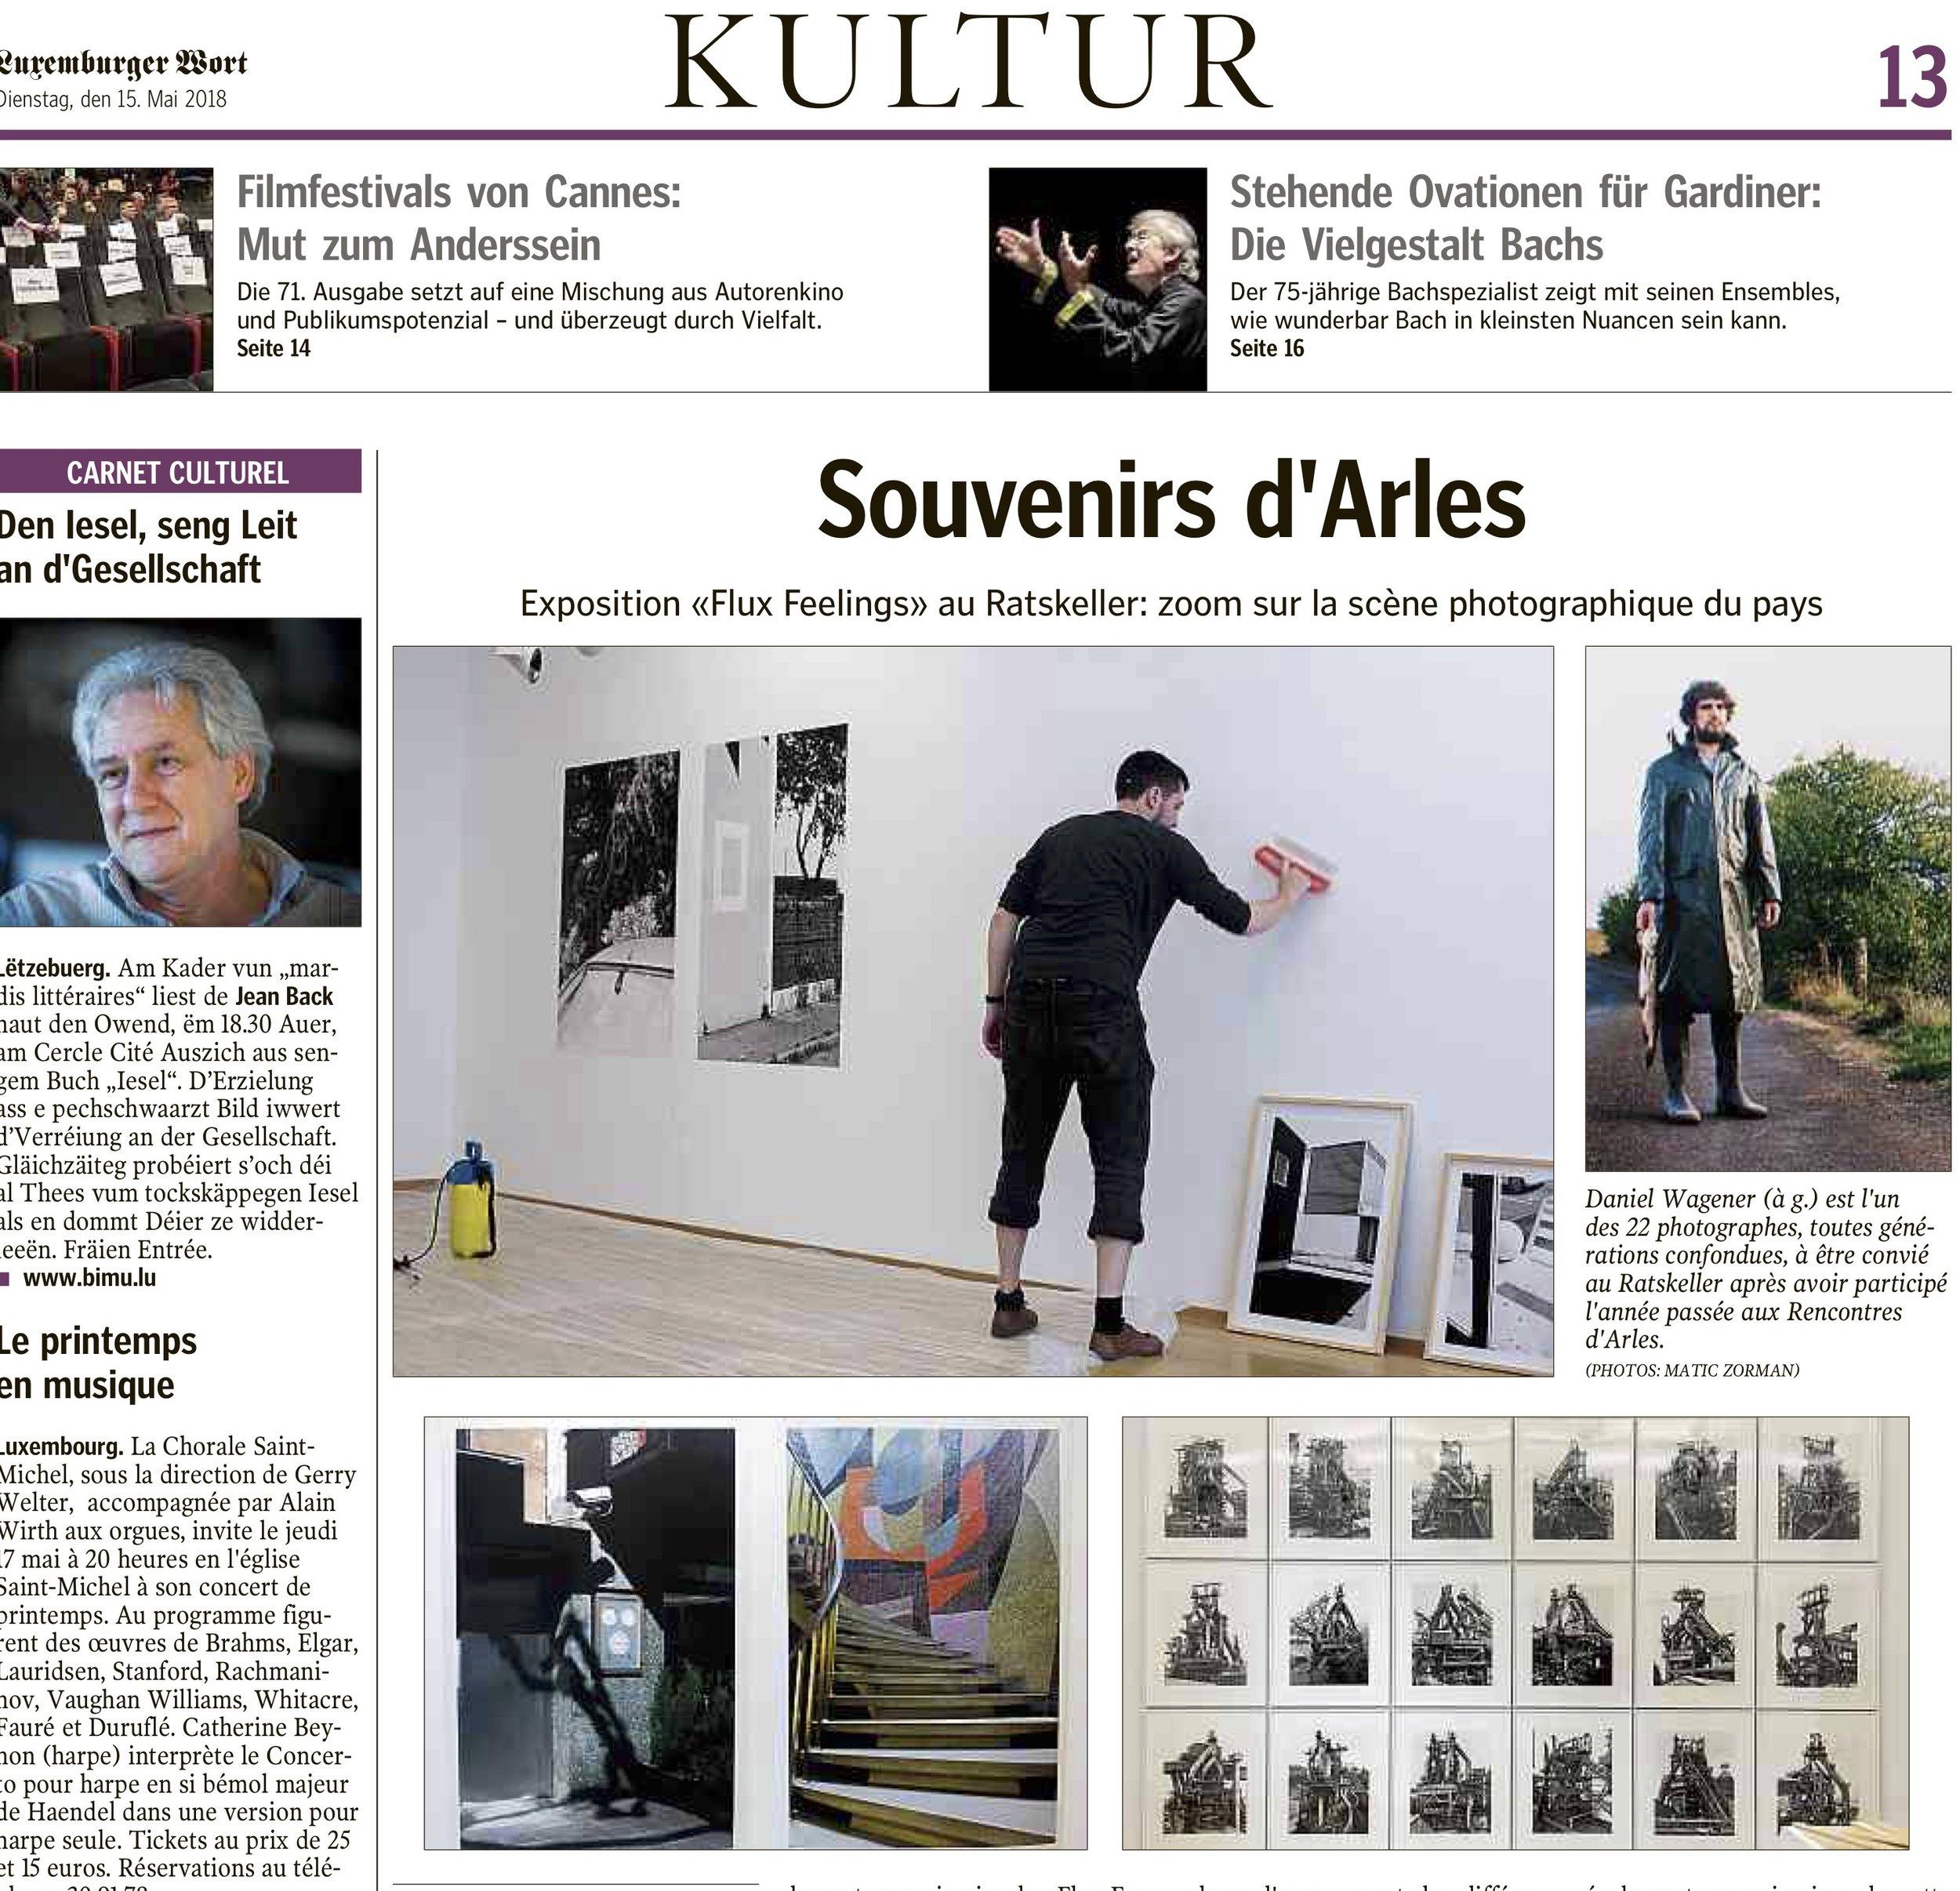 Luxembourger Wort - 15 mai 2018 / Souvenirs d'Arles